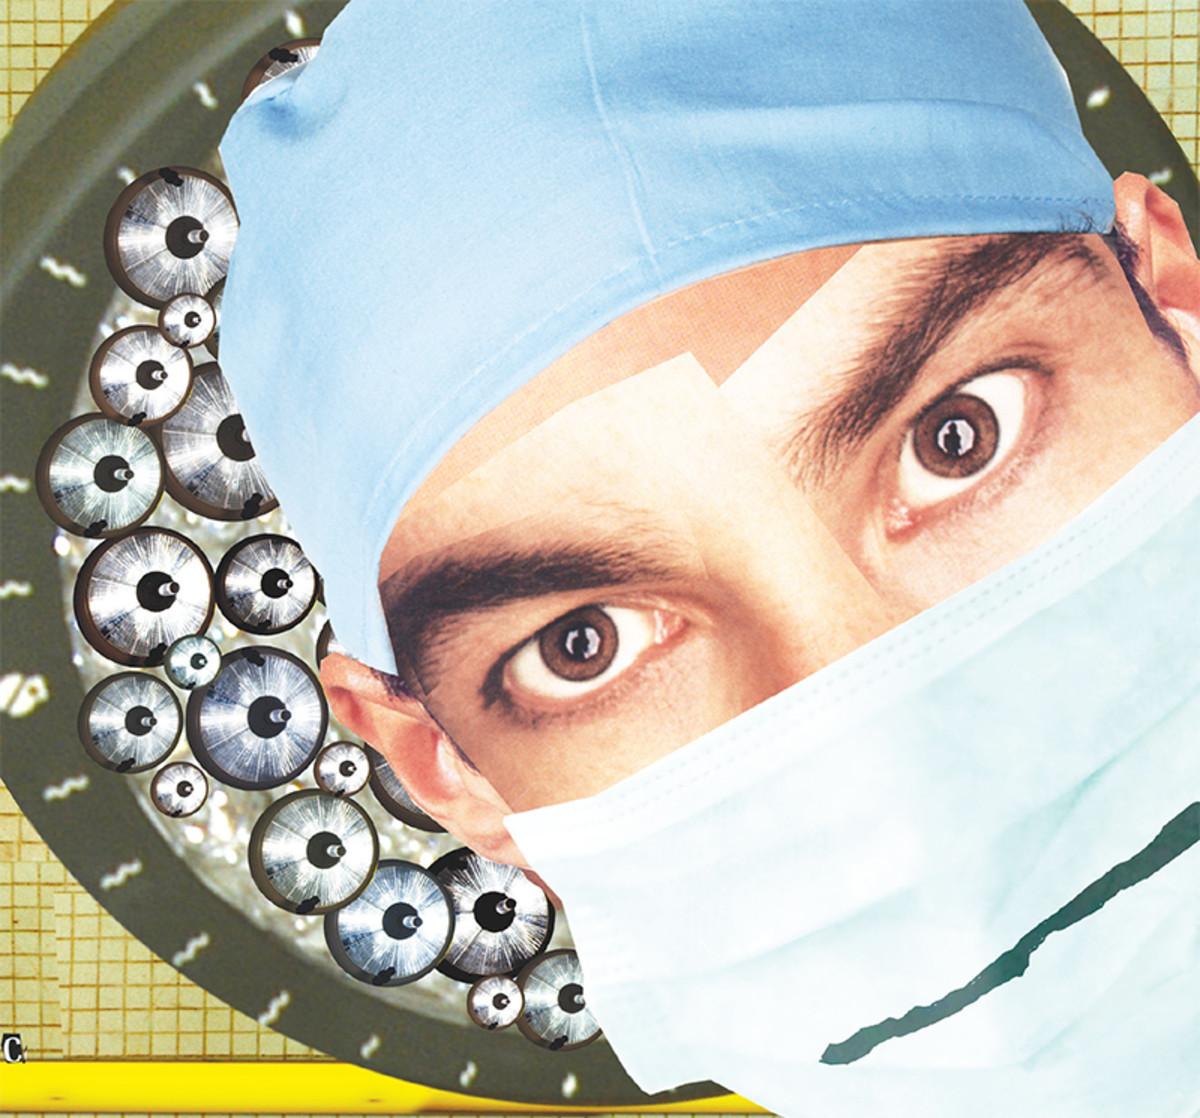 kinder-surgeon-2